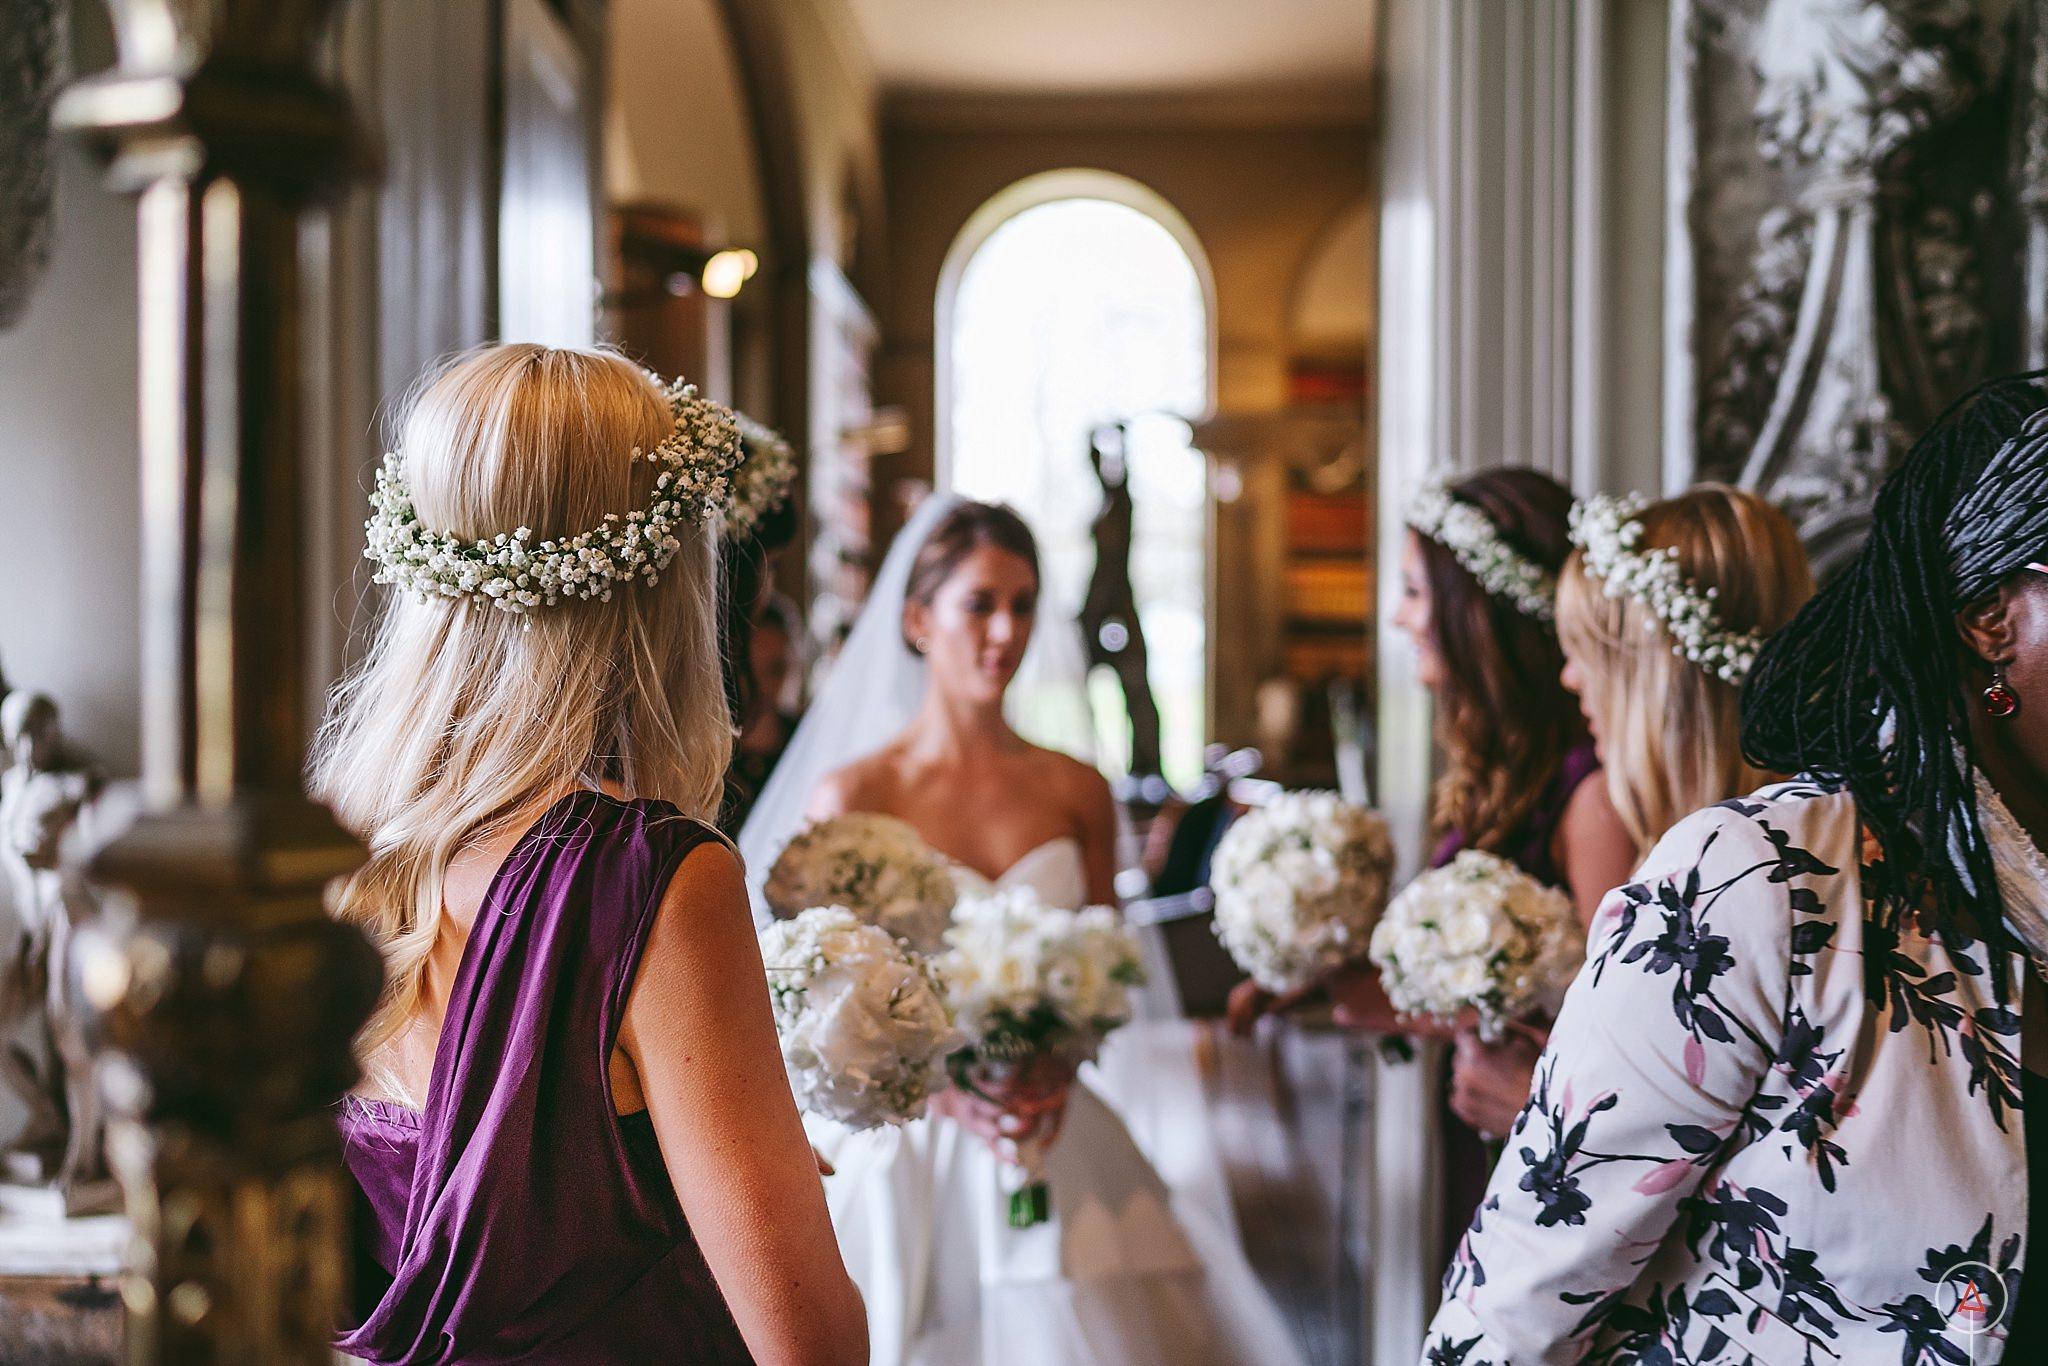 cardiff-wedding-photographer-aga-tomaszek_0249